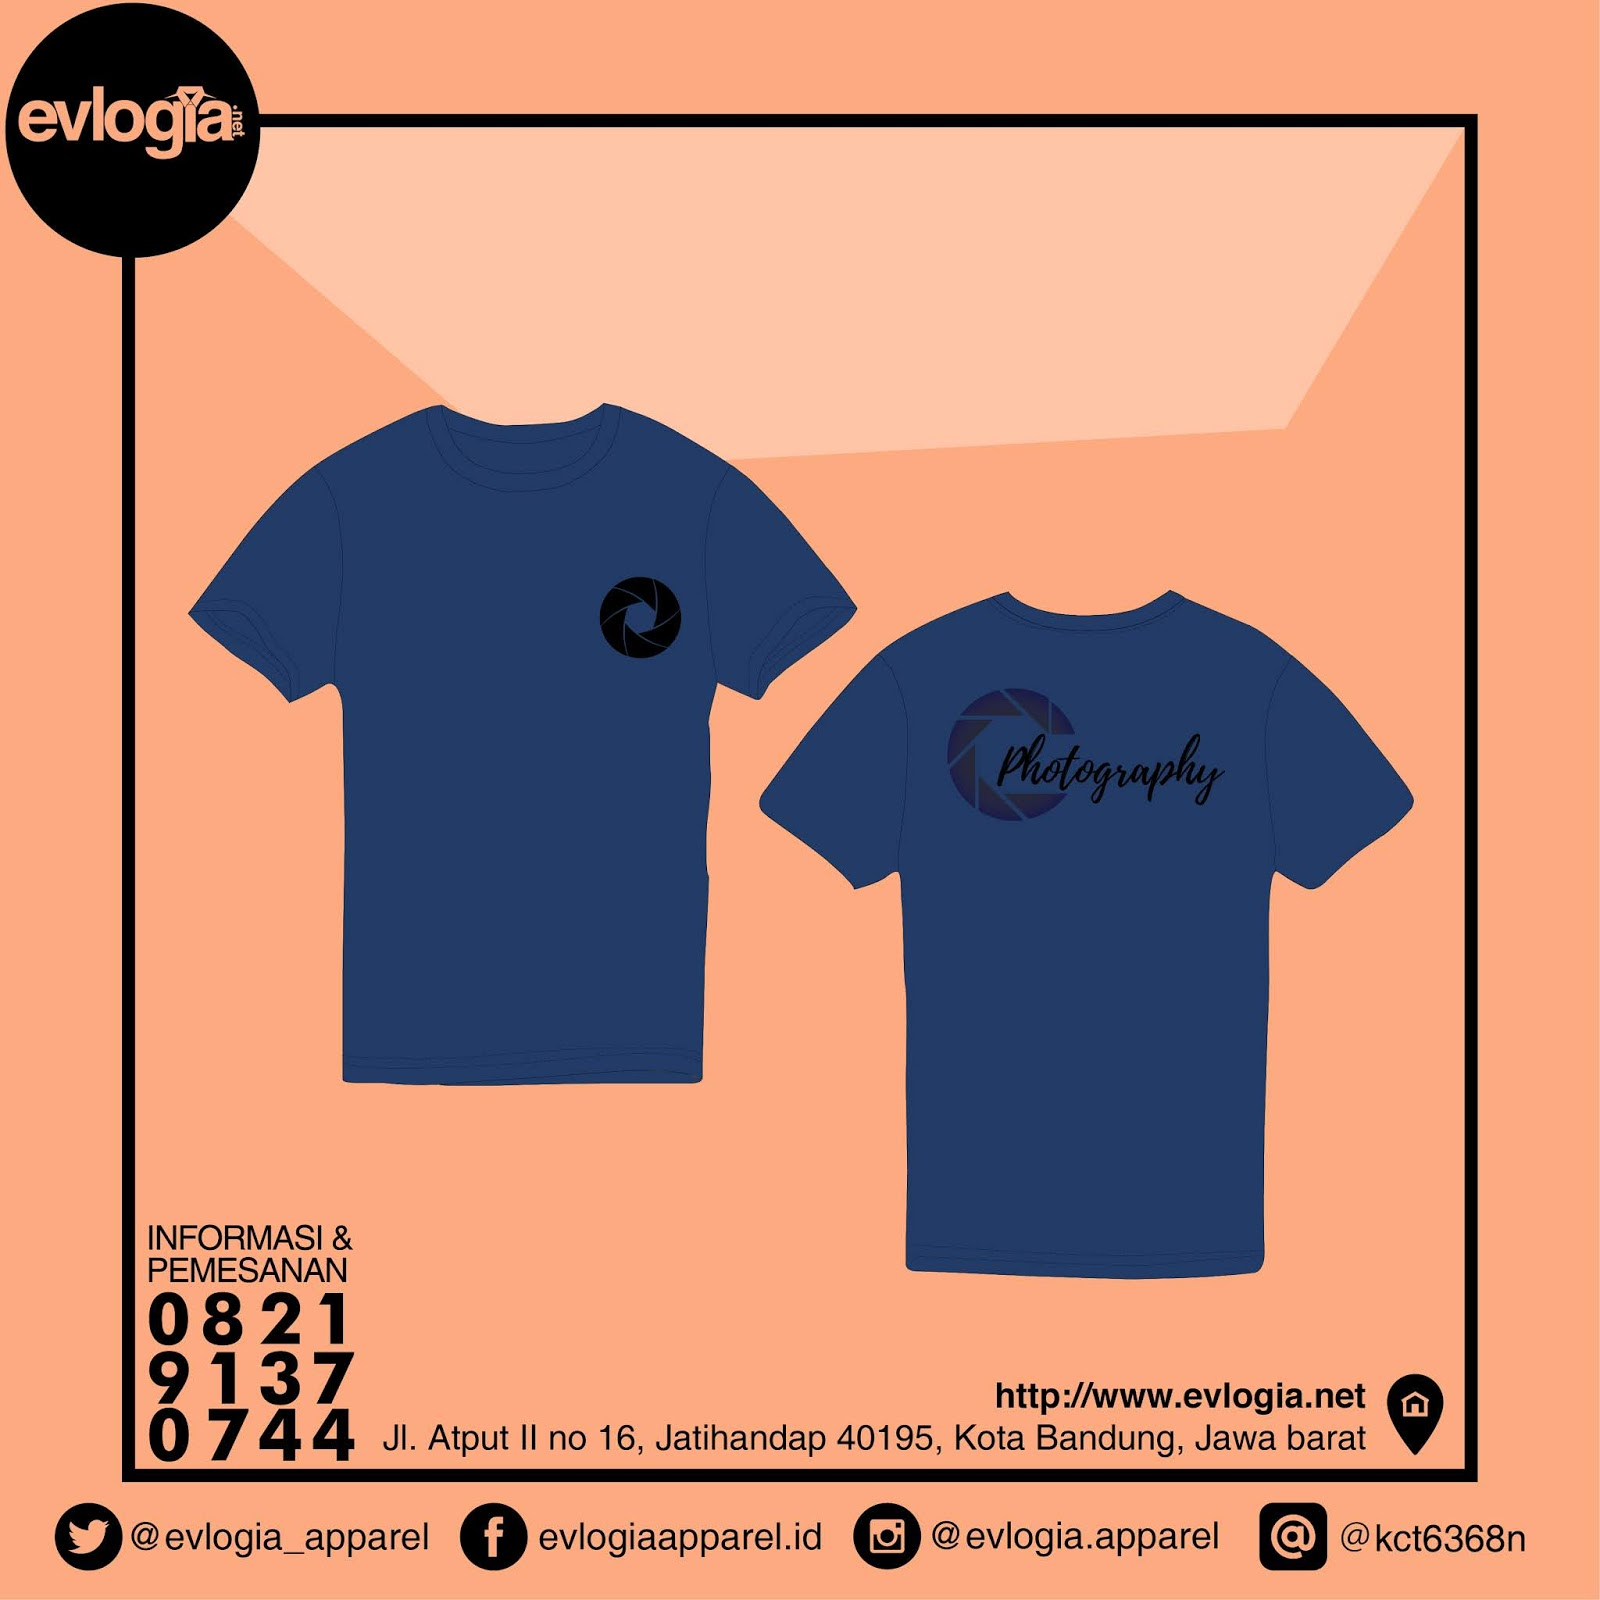 Bikin Kaos / Baju Murah Berkualitas Bandung - Model Photography